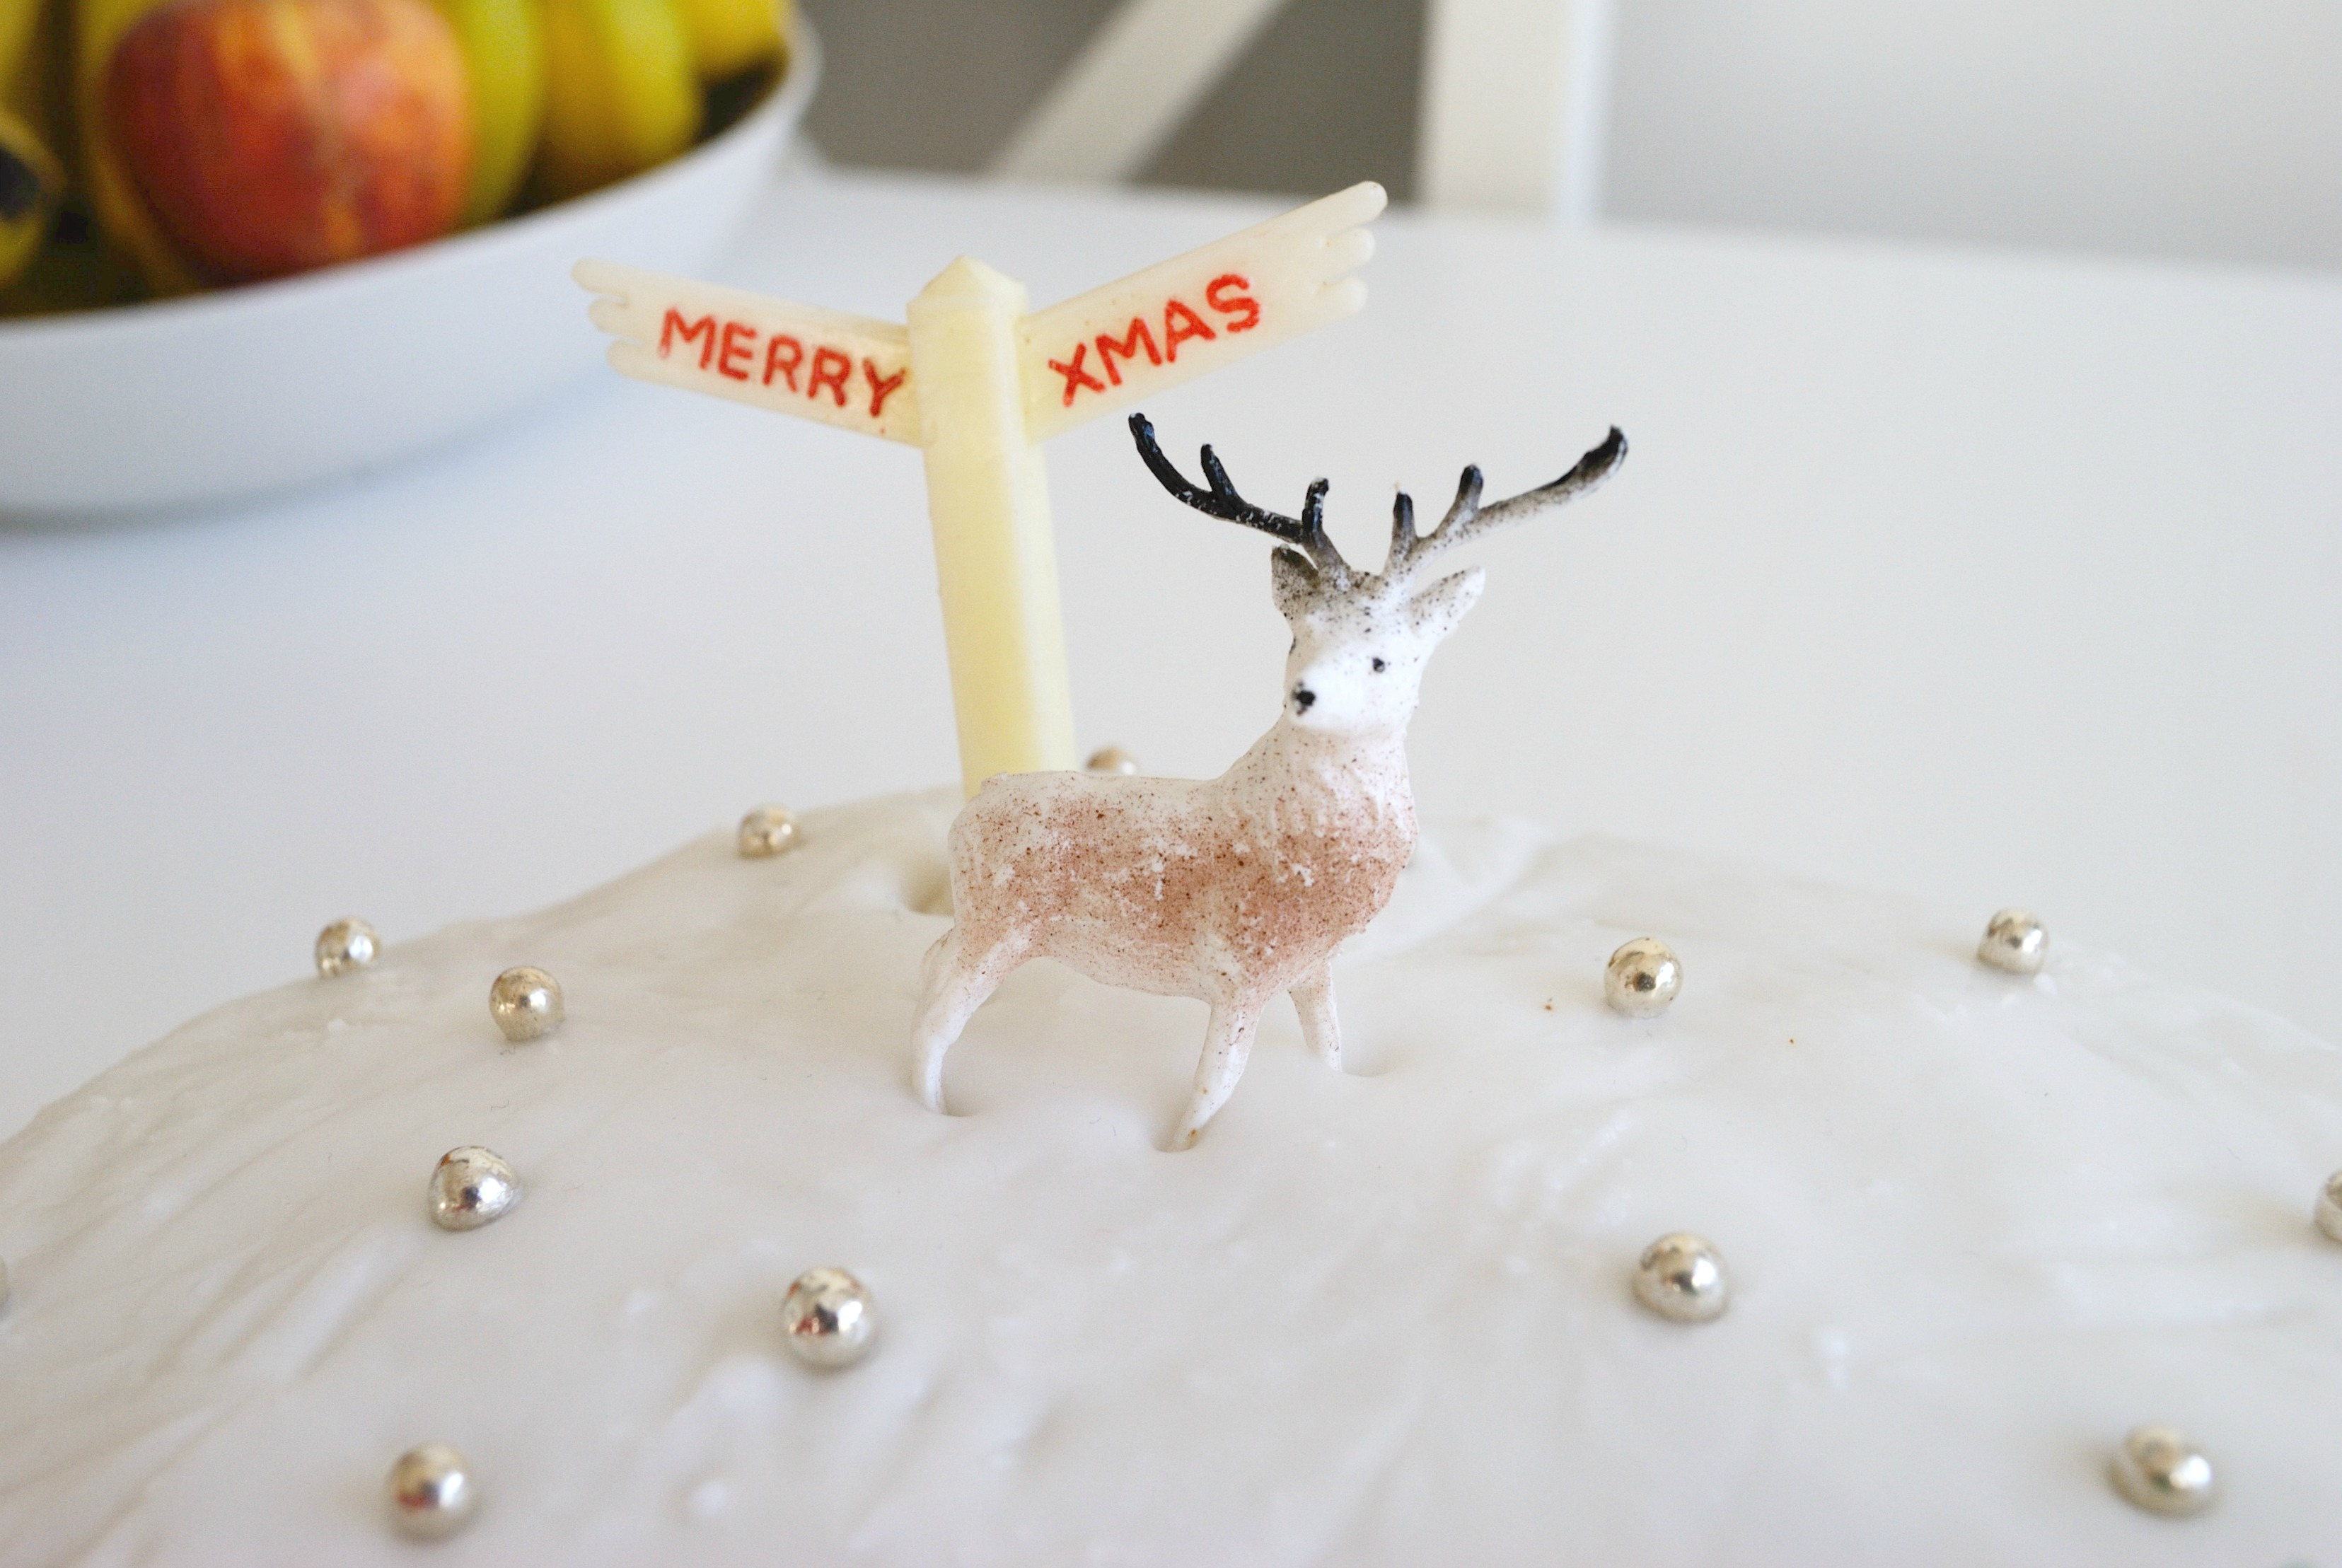 This Year's Christmas Cake